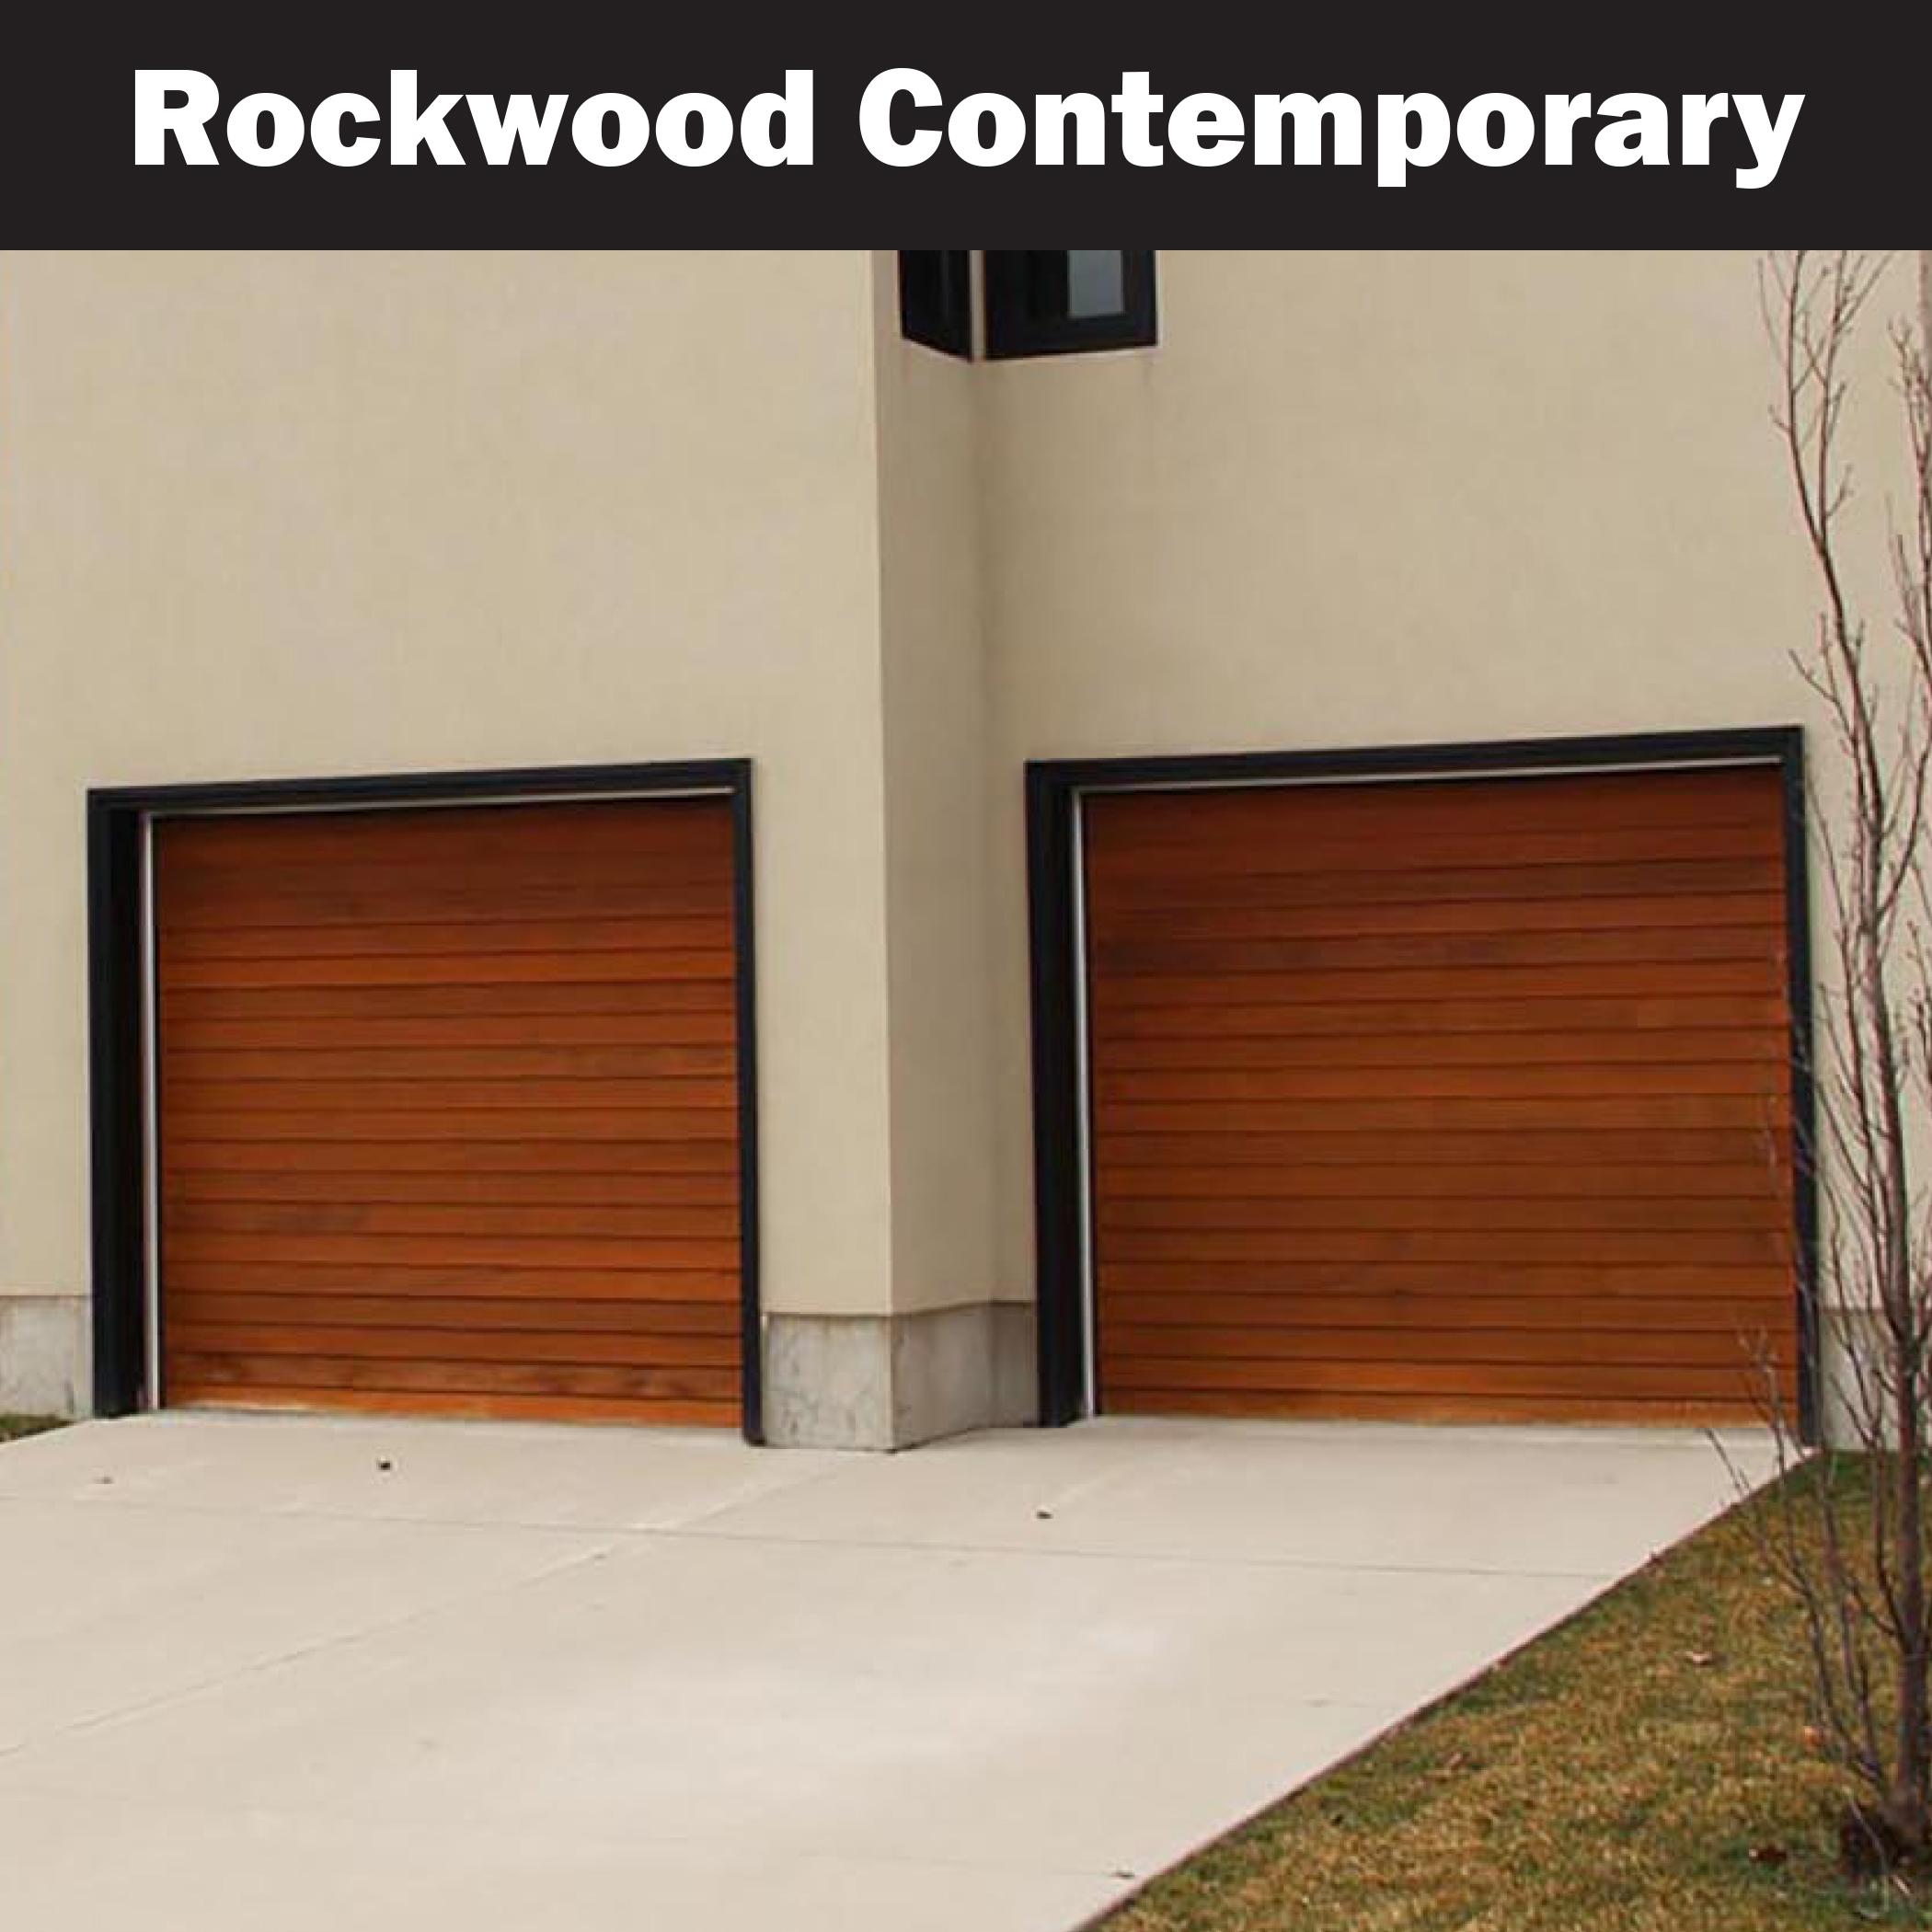 Rockwood Contemporary.jpg